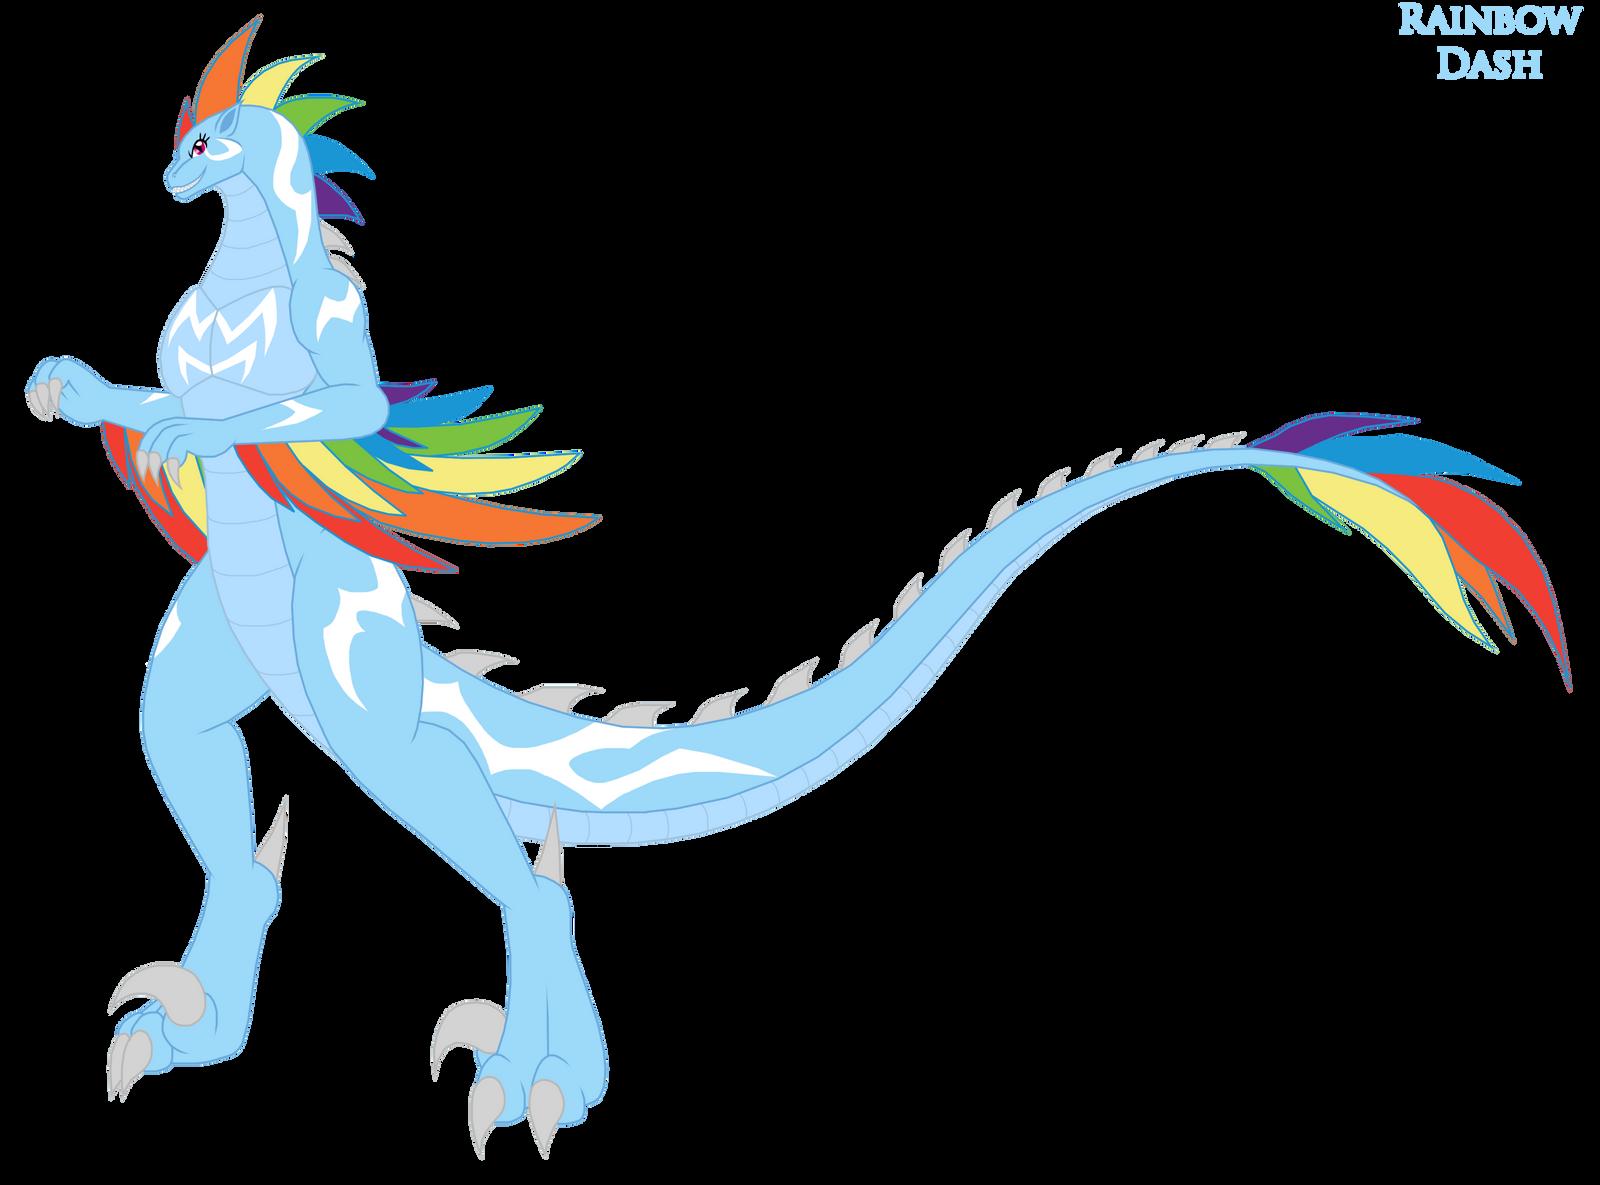 Rainbow Dash Kaiju Form by Pyrus-Leonidas on DeviantArt